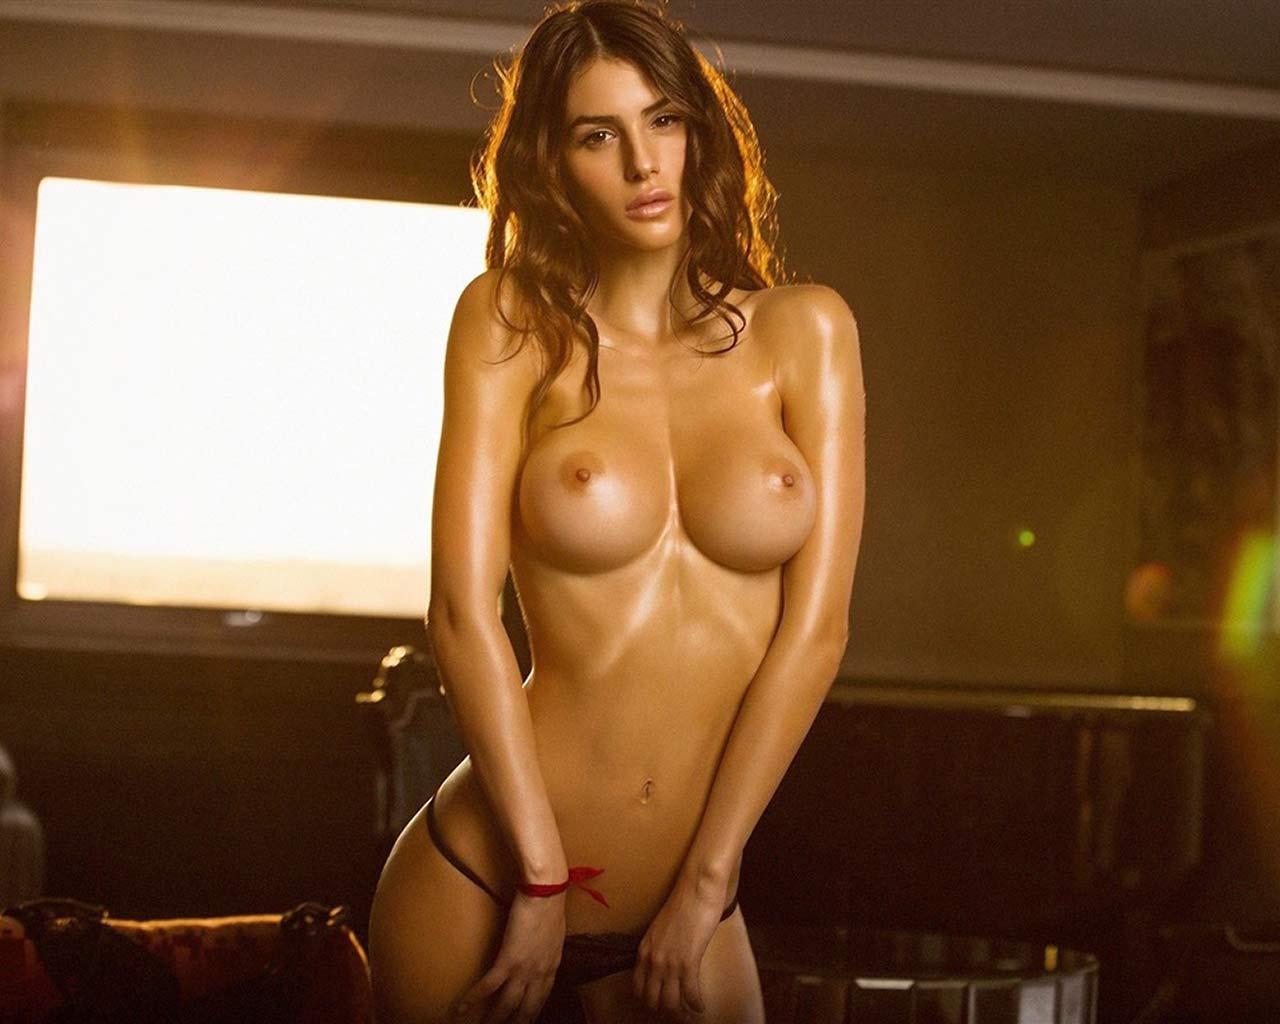 Pussy Silvia Caruso nude photos 2019